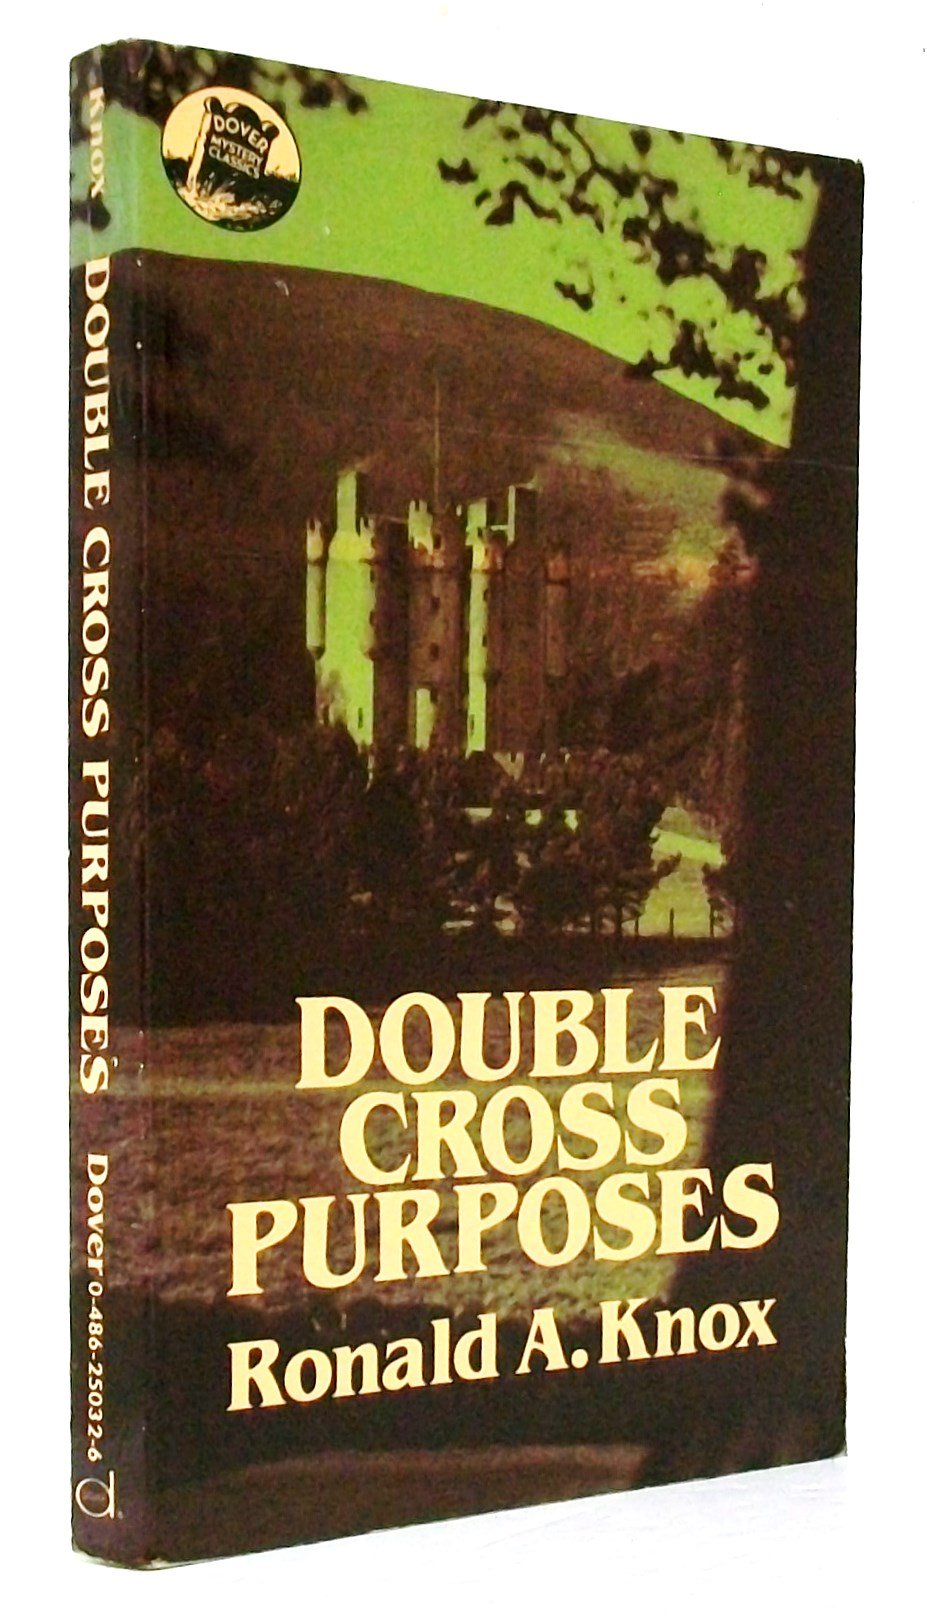 double cross purposes knox ronald